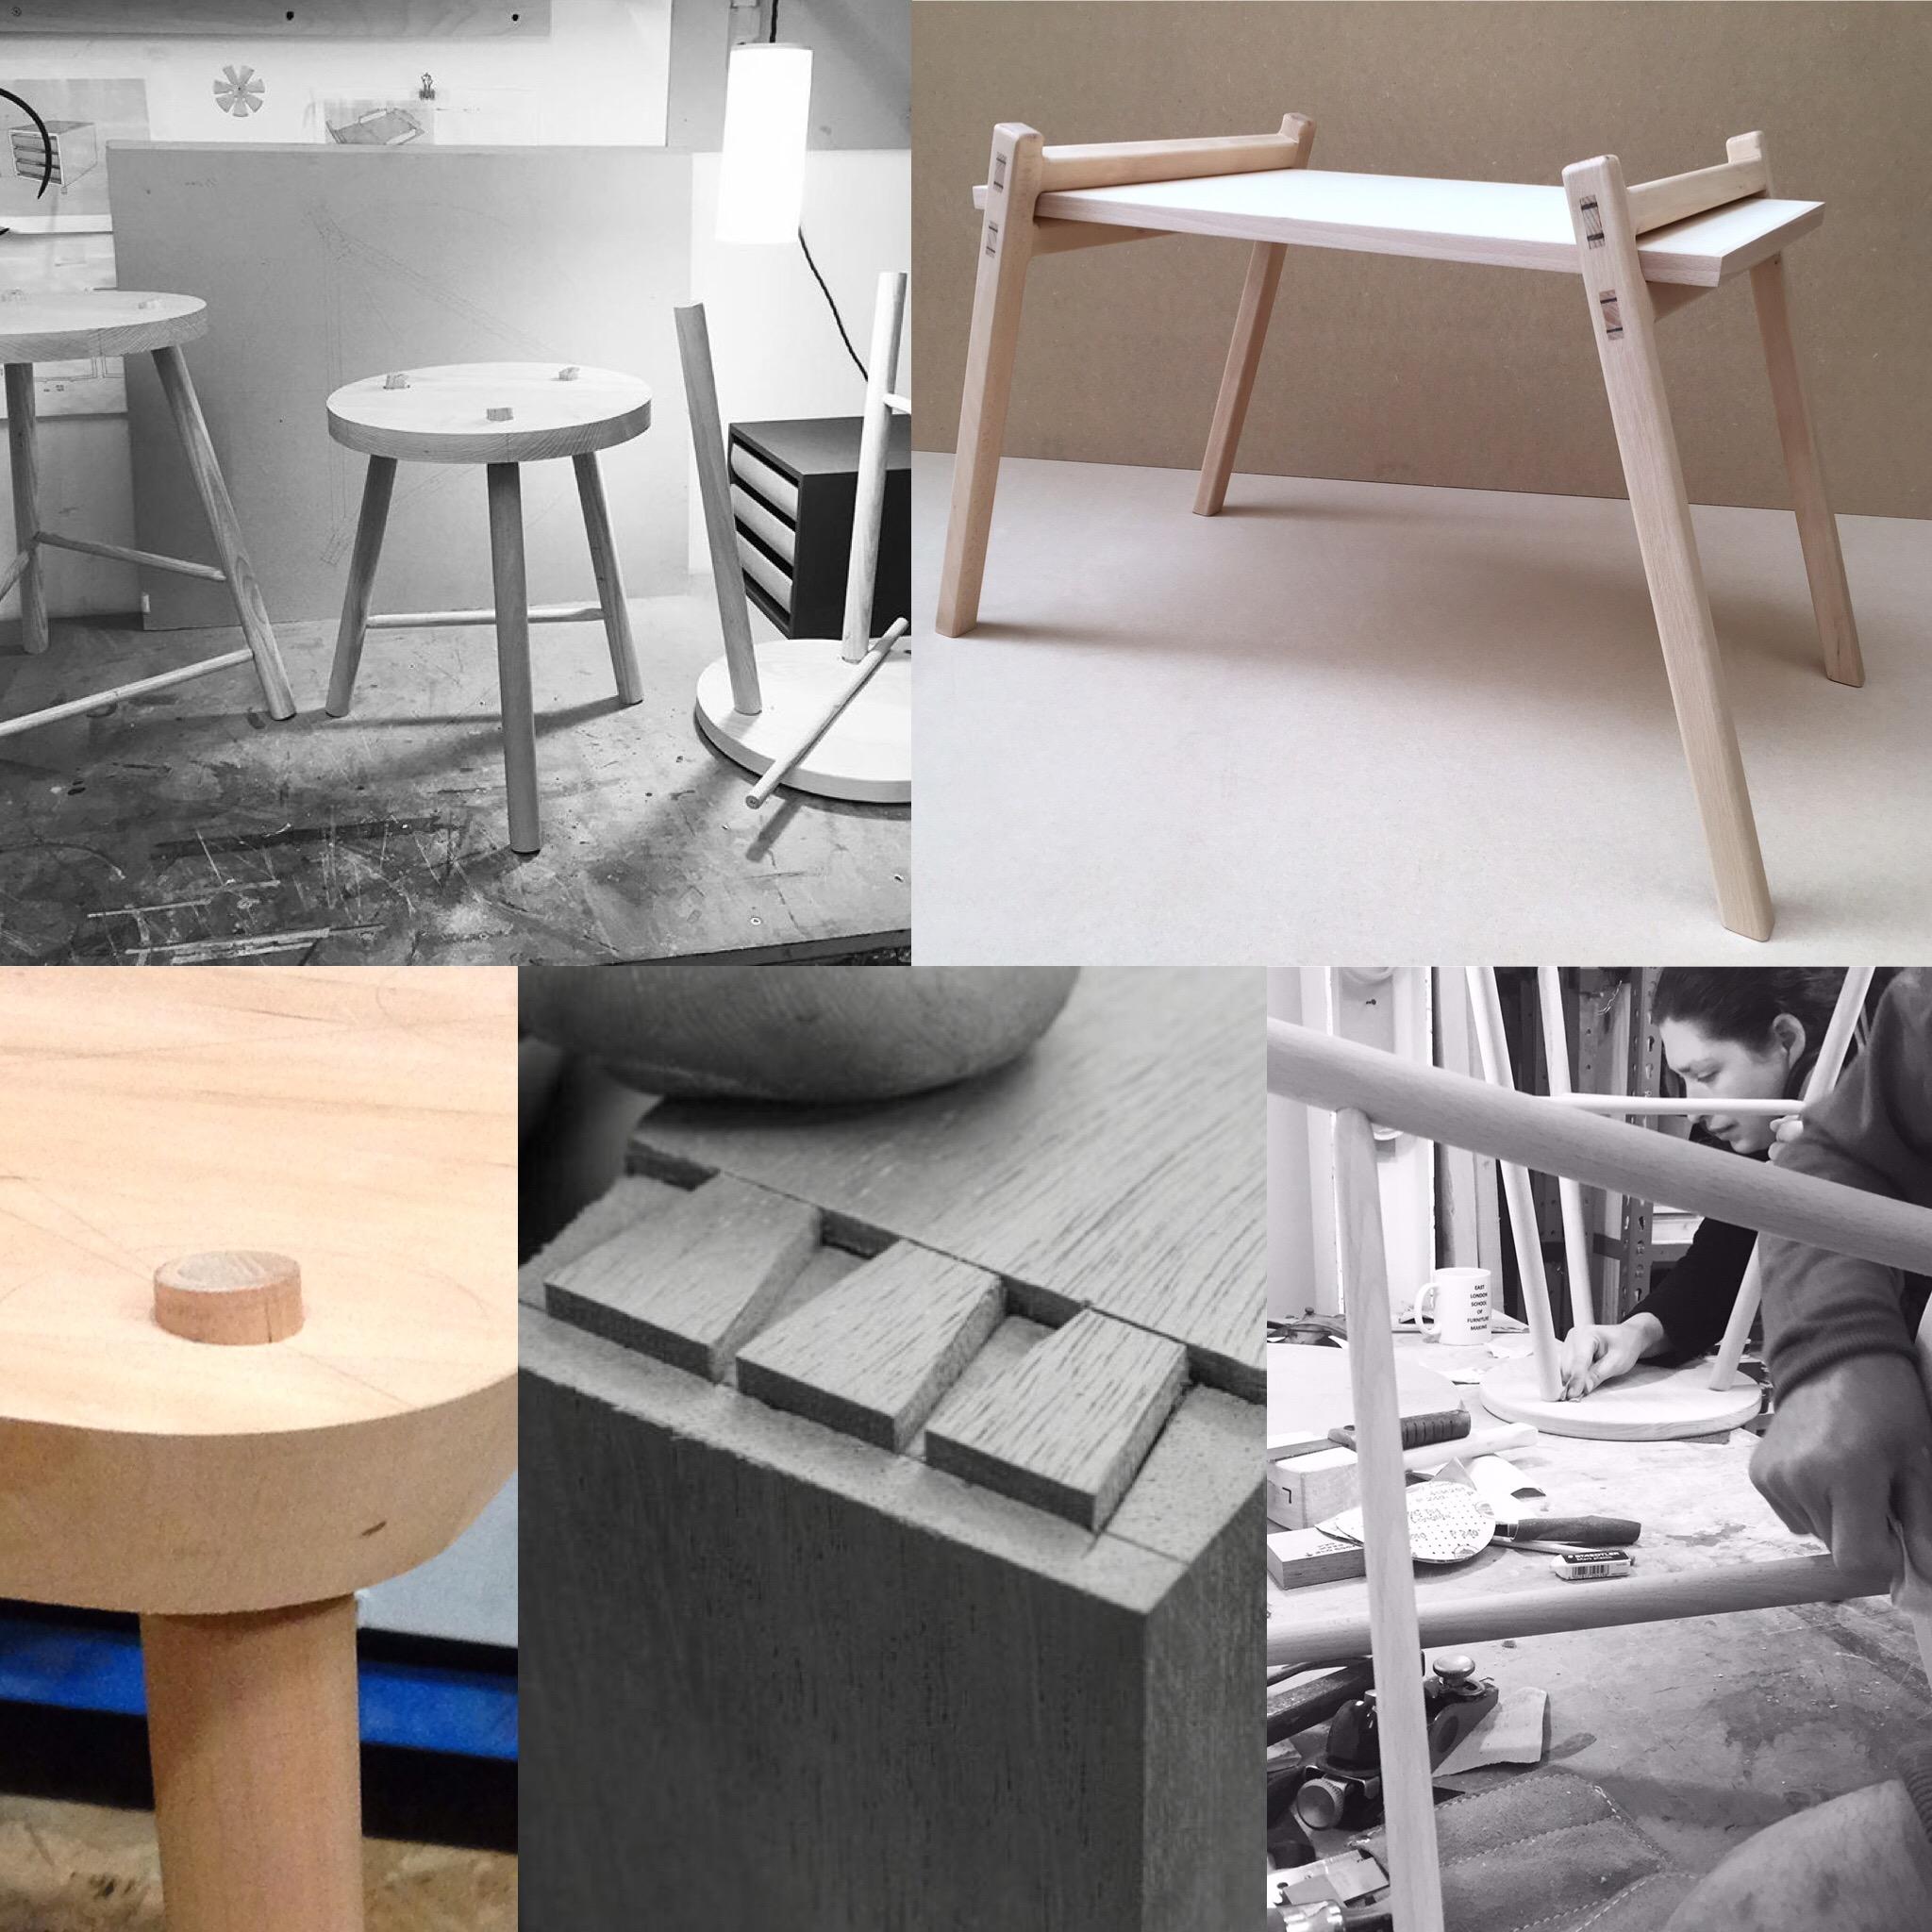 New School of furniture making